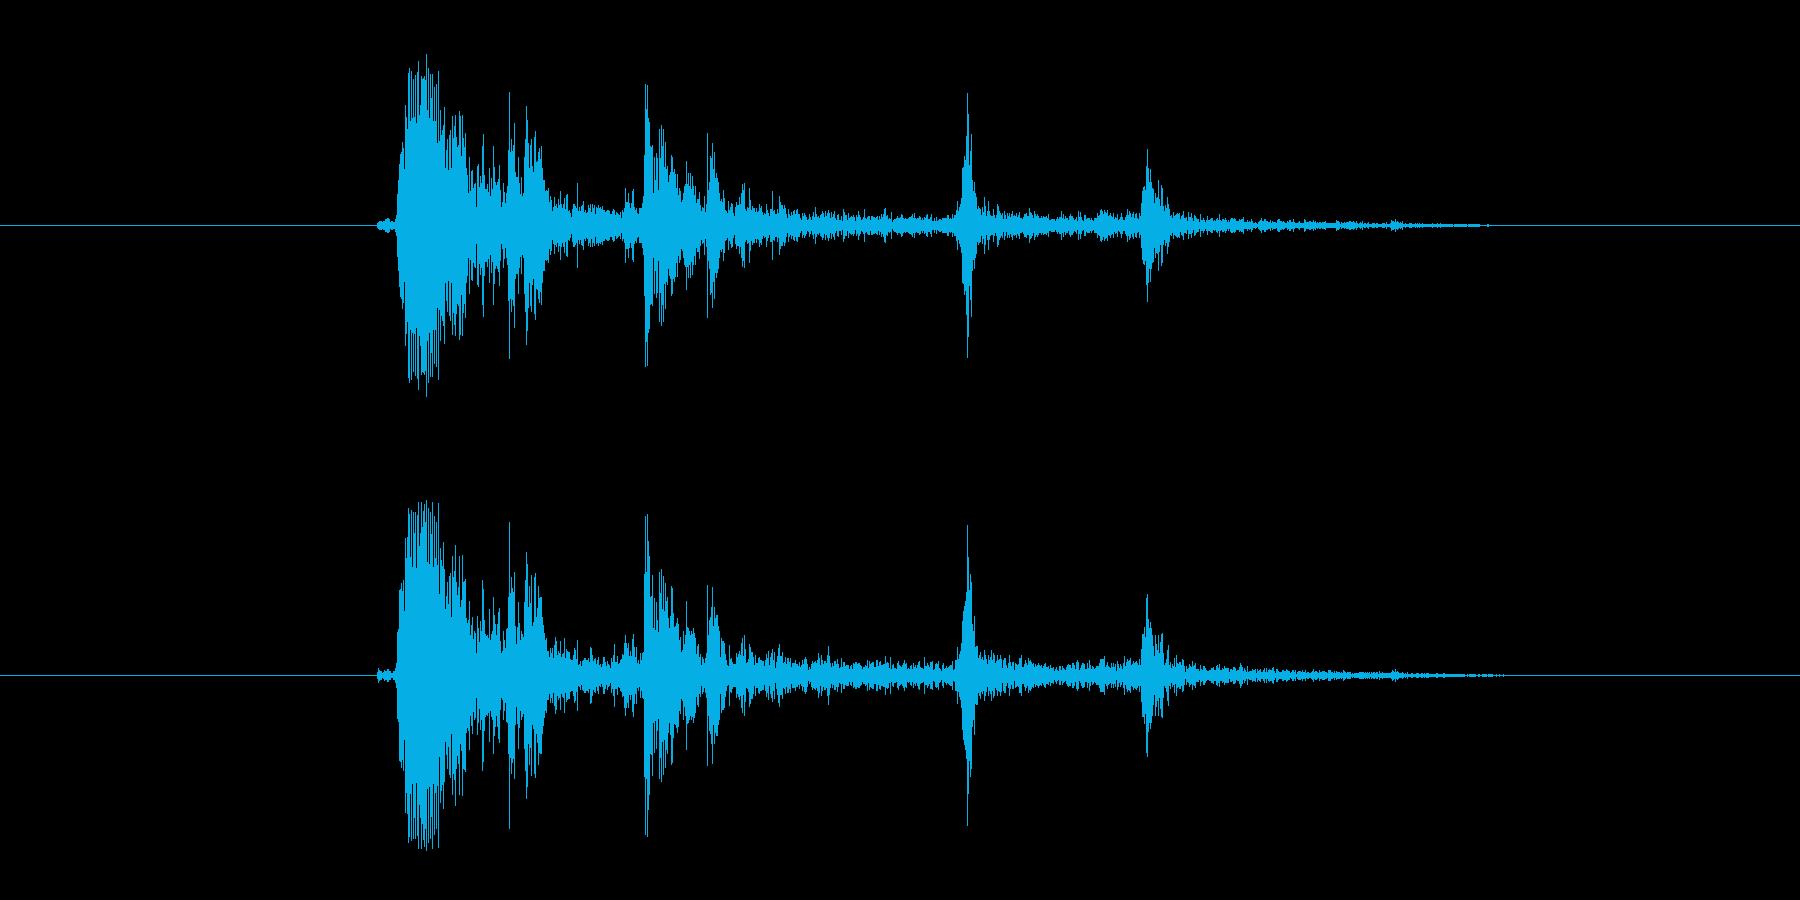 FX・SE/ガン/銃/システム音/カシャの再生済みの波形